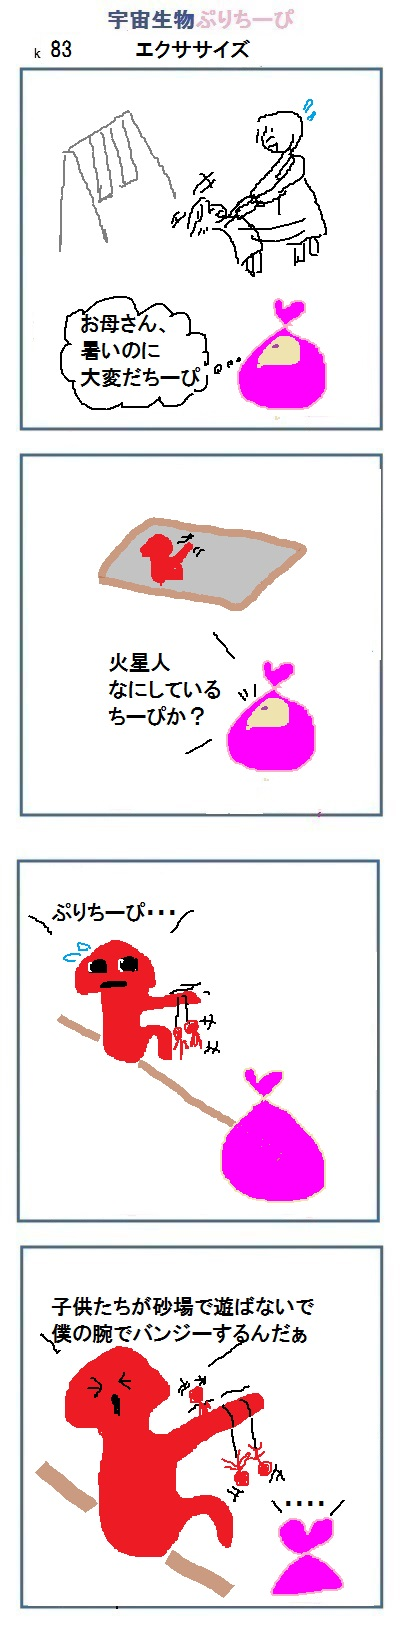 160827_k83.jpg